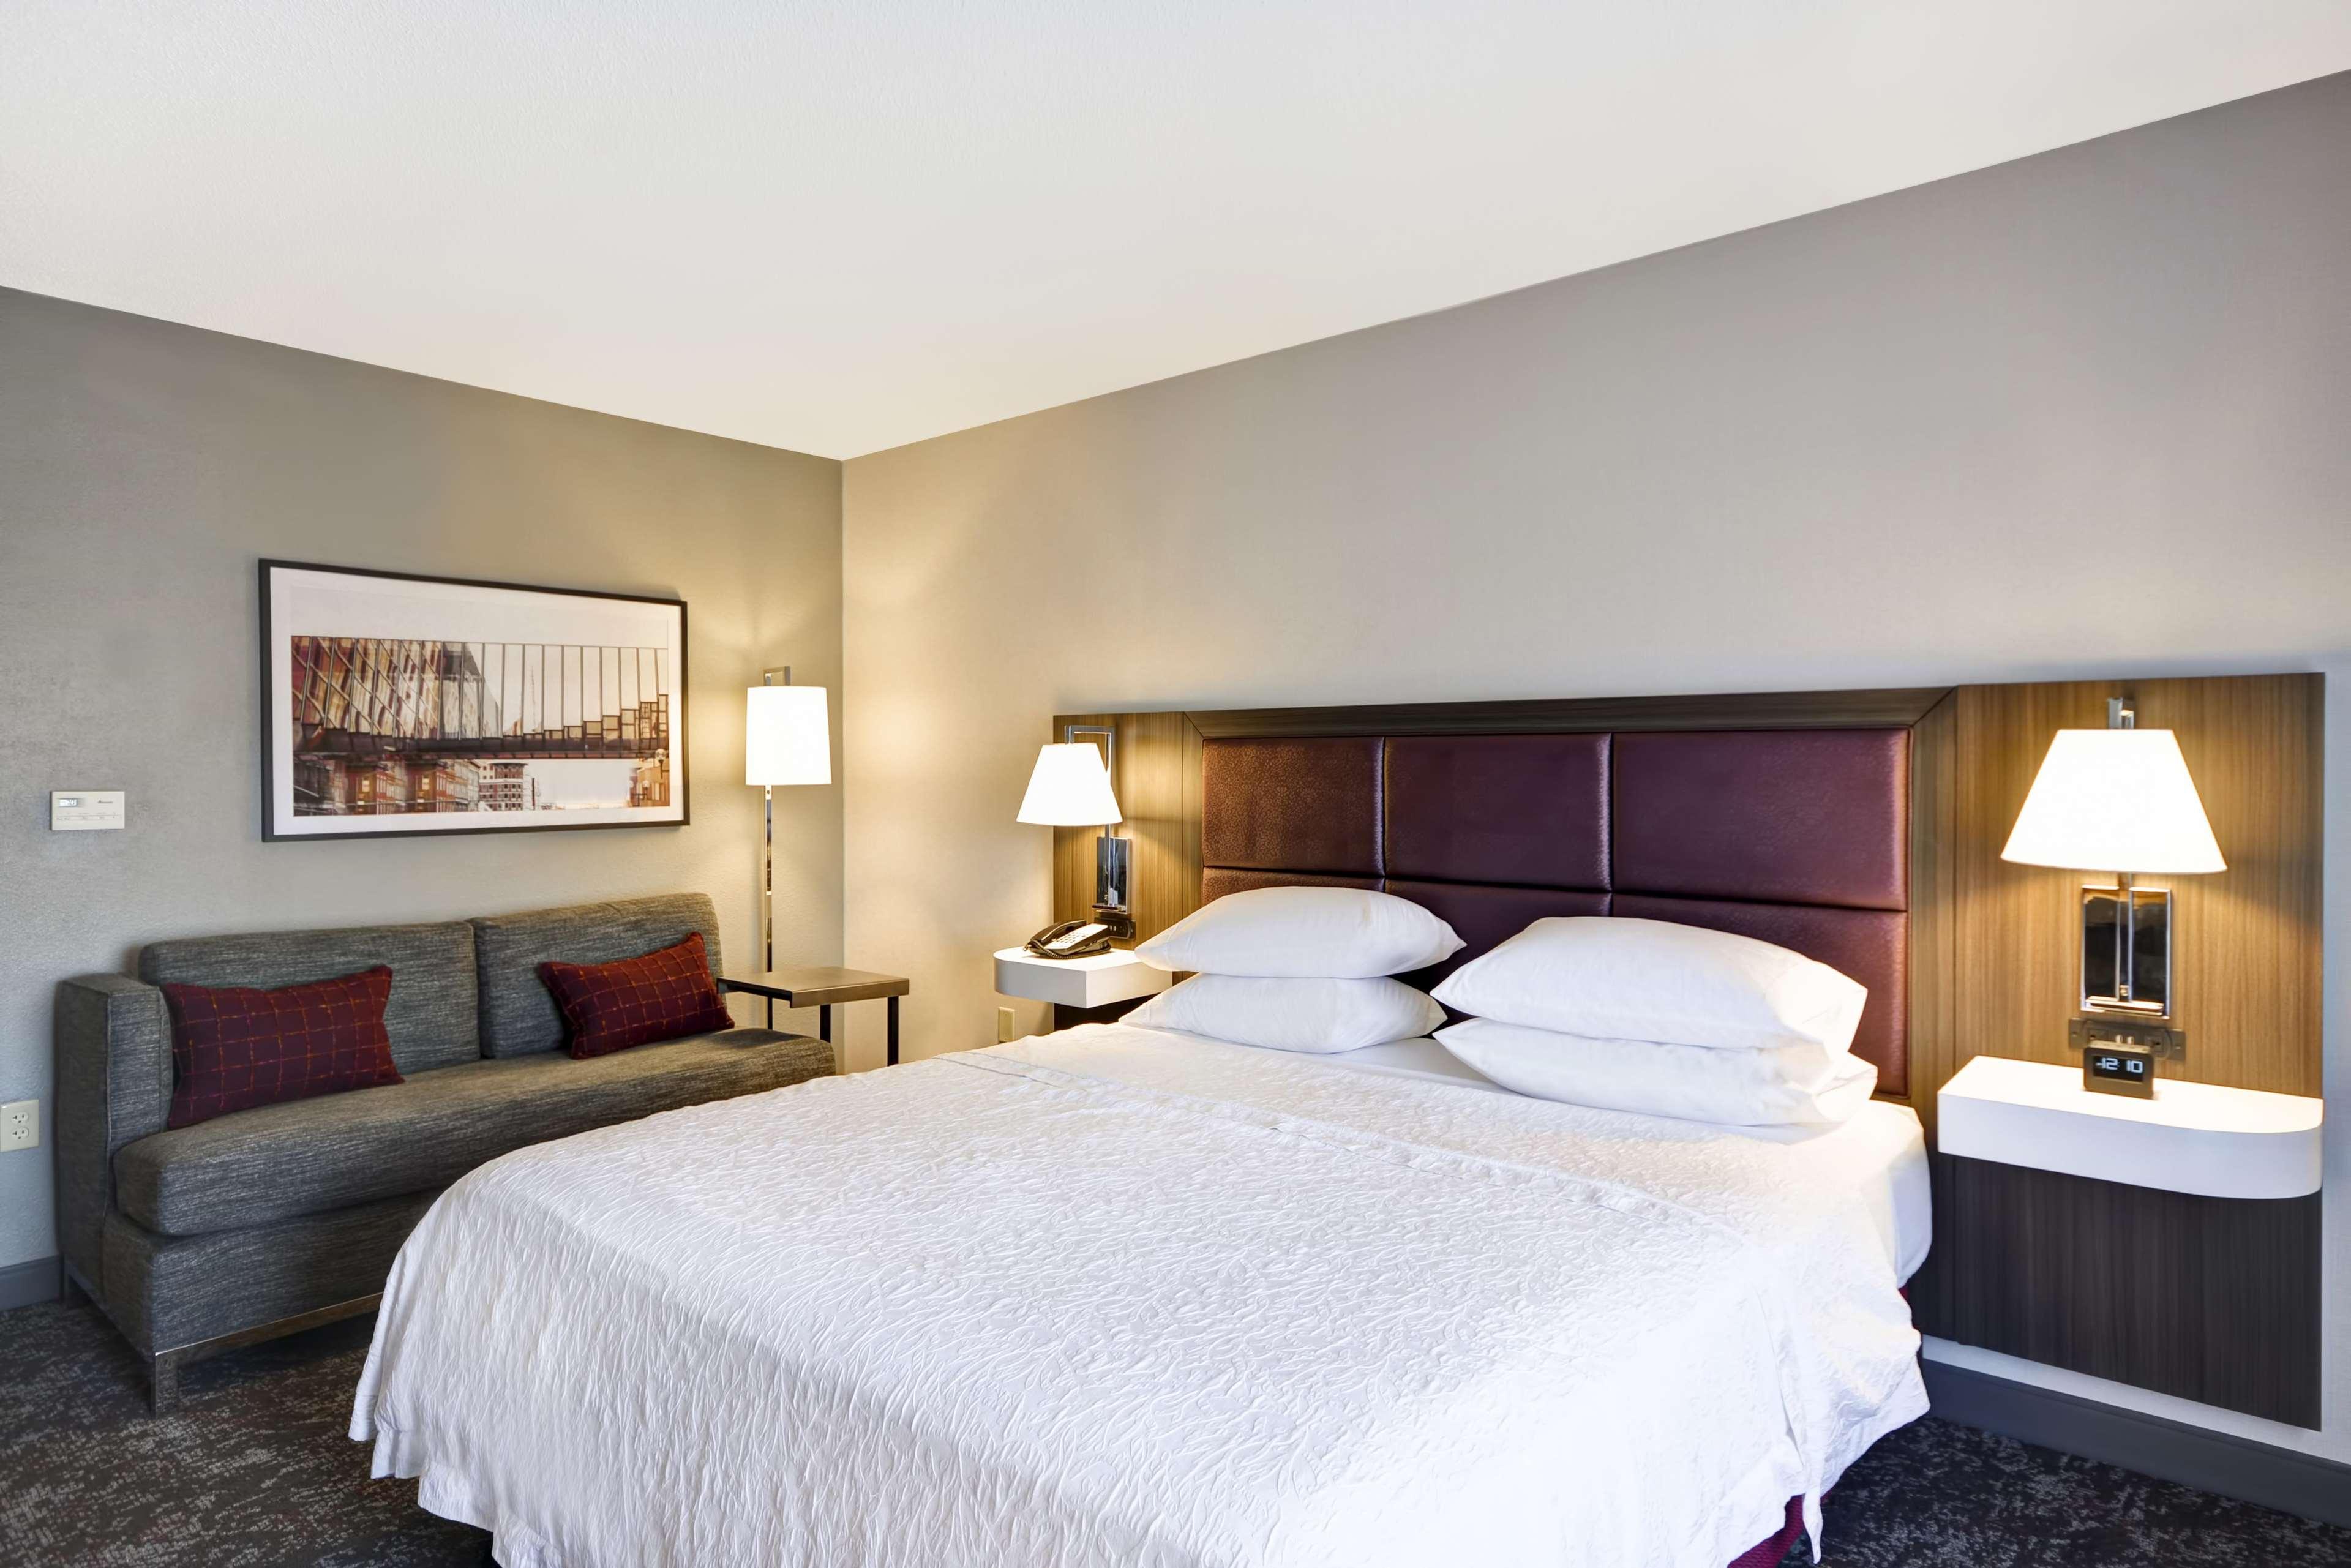 Hampton Inn & Suites Columbus-Easton Area image 45